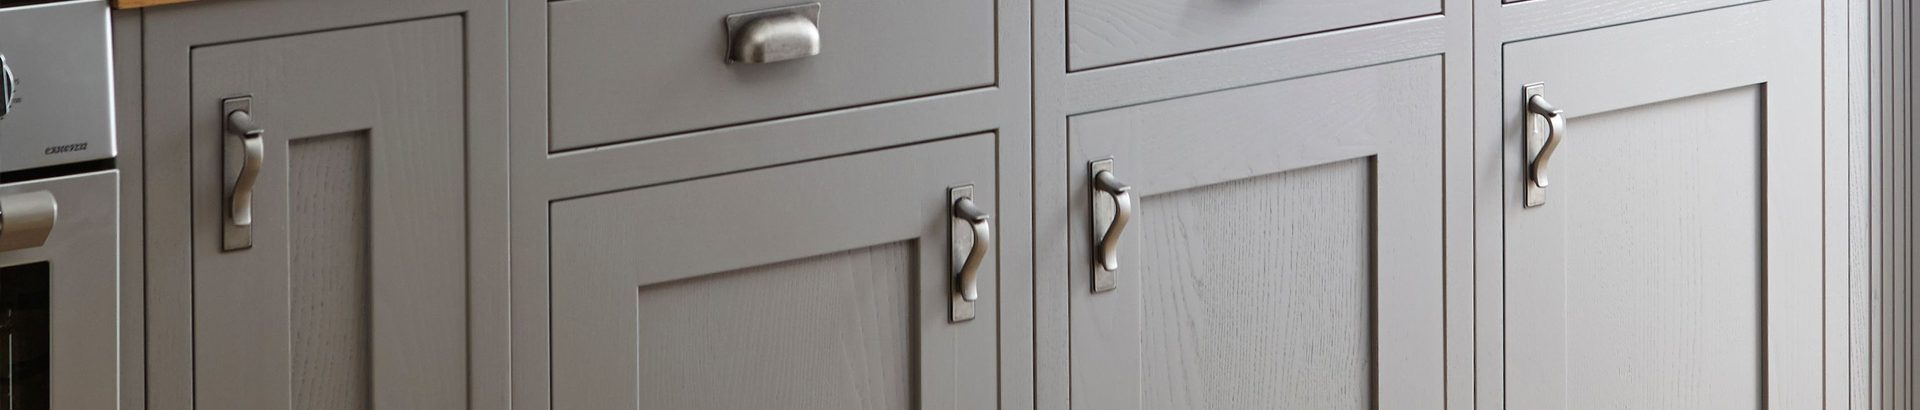 We offer the best design for kitchen doors